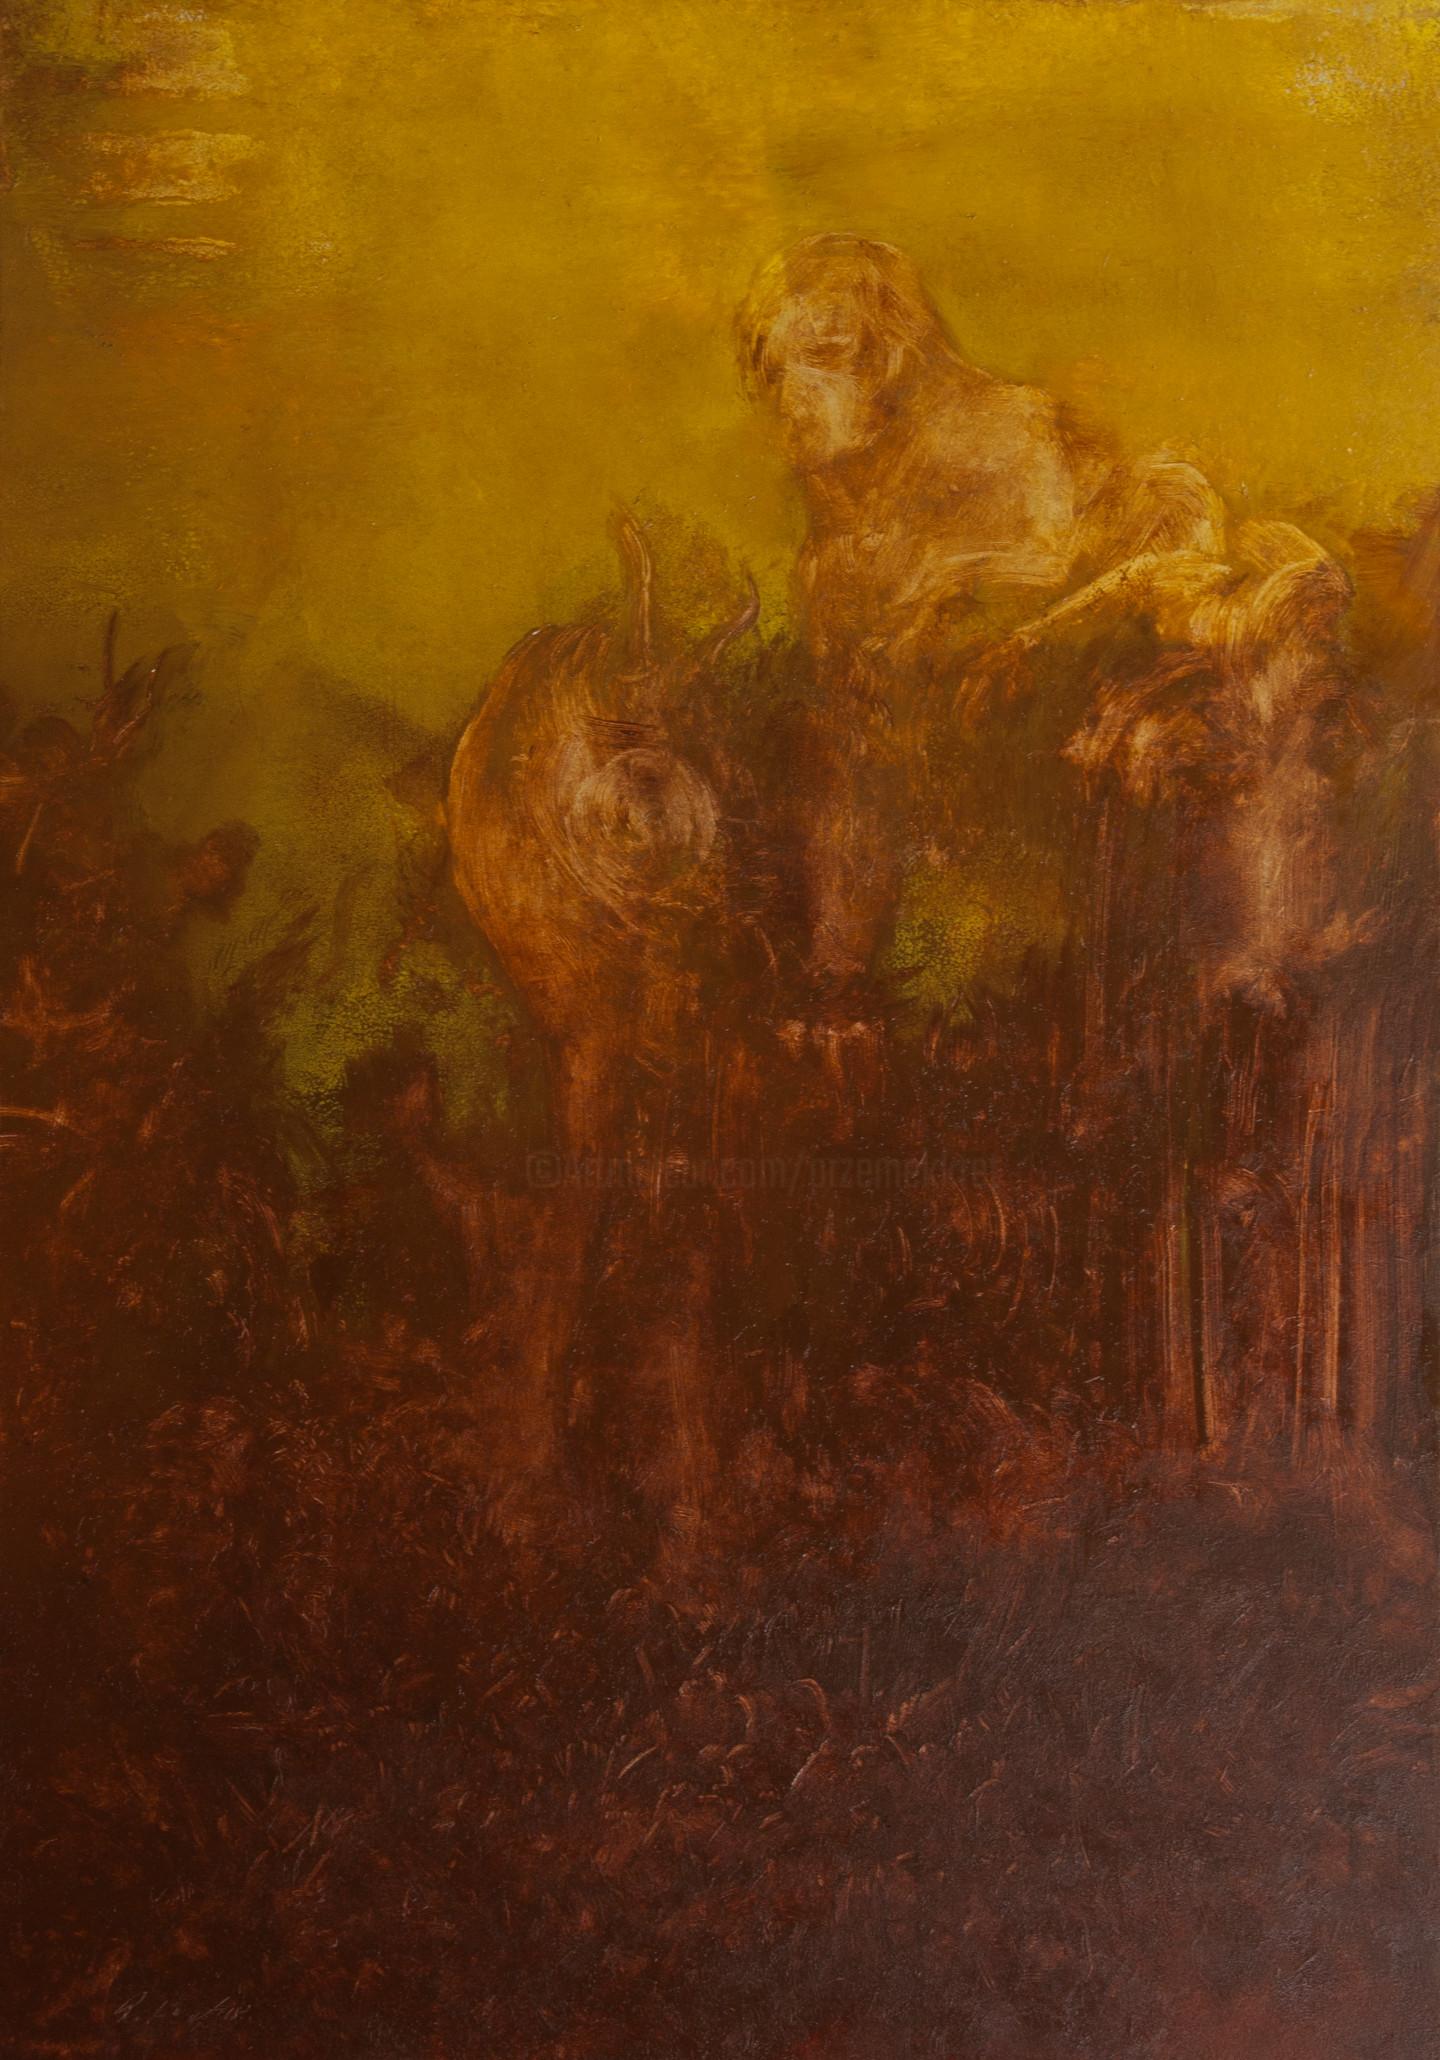 Przemek Kret - Beast of Burden (unburdening Rilke)